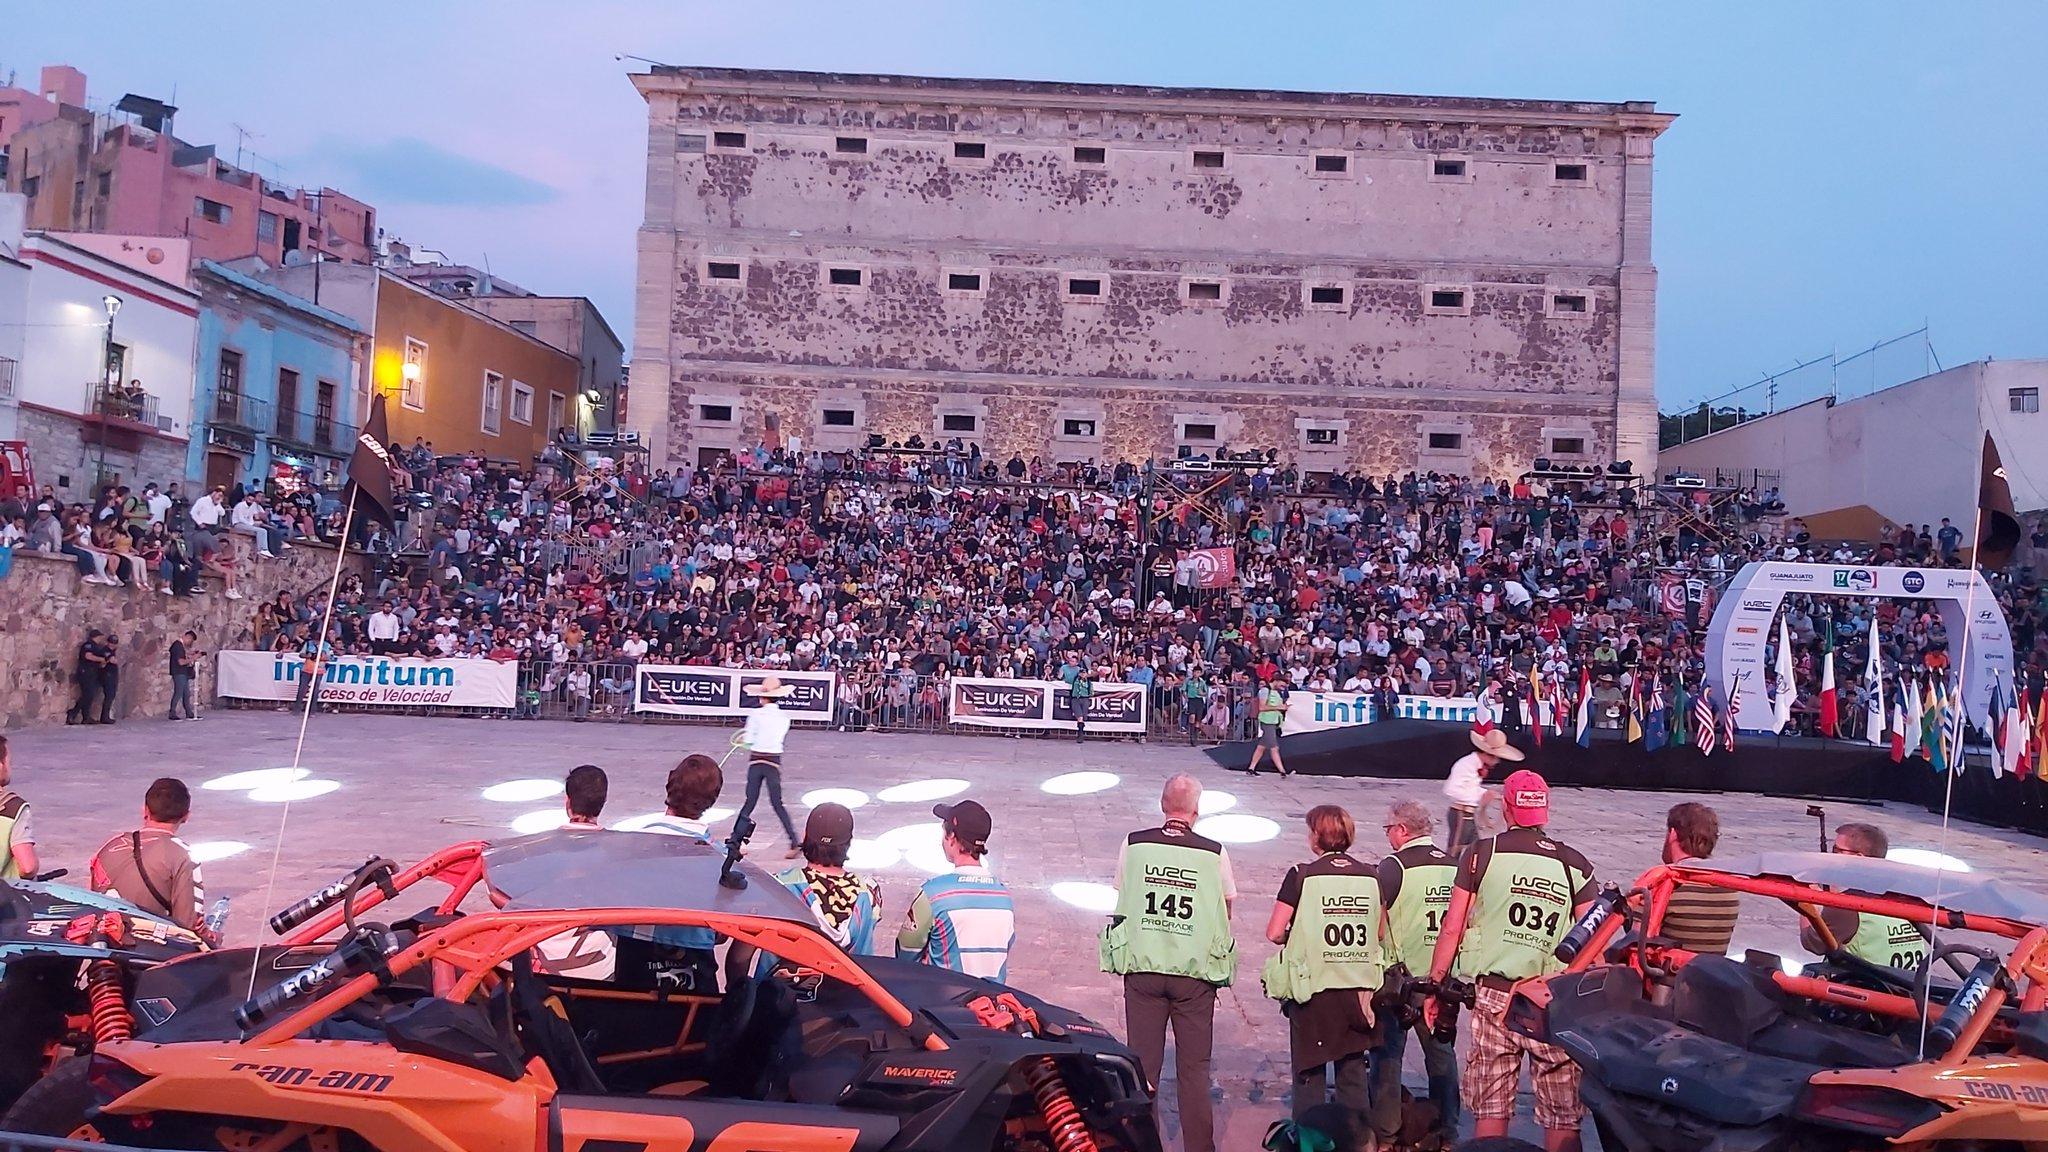 WRC: 17º Rallye Guanajuato Corona - México [12-15 Marzo] - Página 2 ES833IYU8AAf8xw?format=jpg&name=large